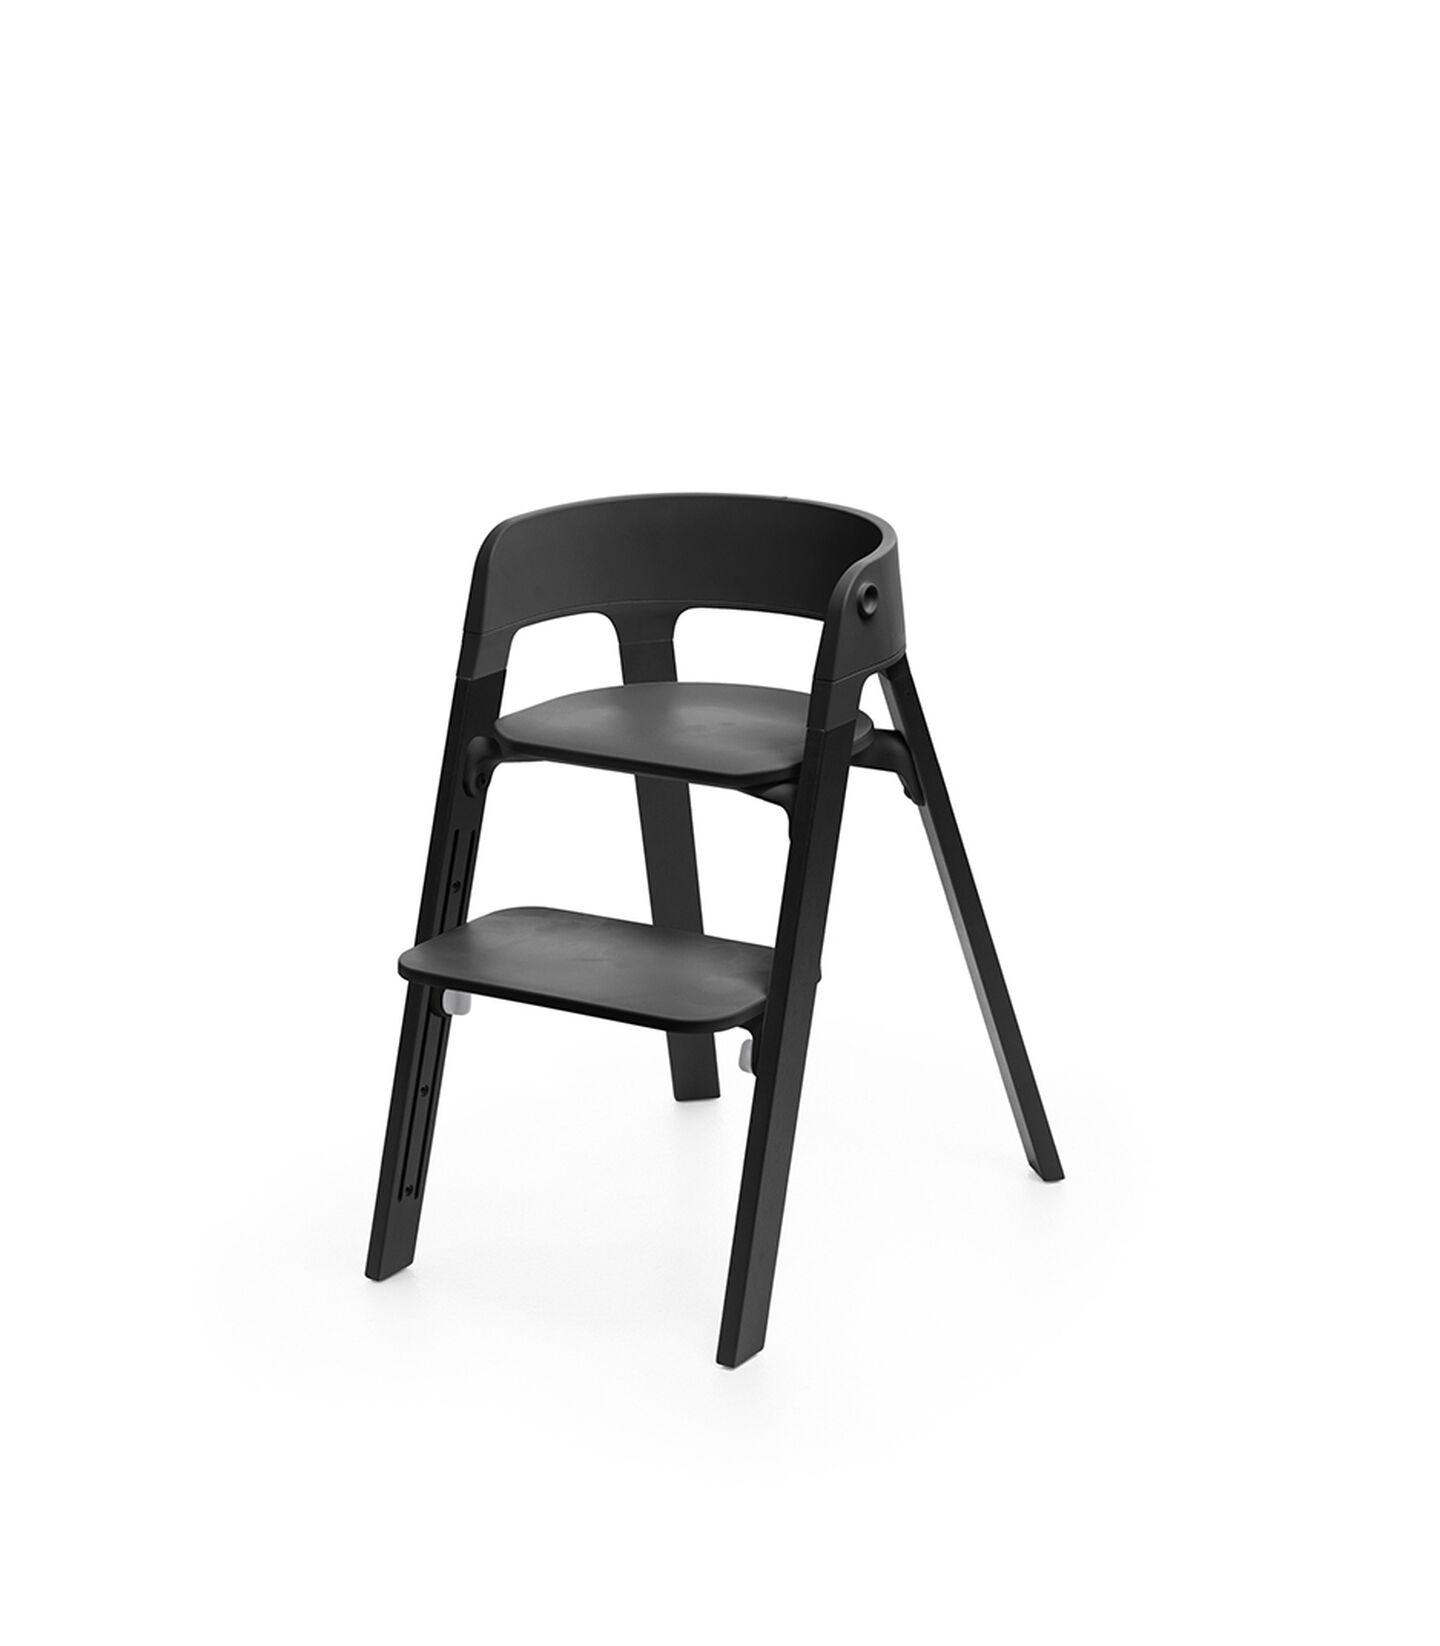 Stokke® Steps™ Chair Black Seat Oak Black Legs, Oak Black, mainview view 1